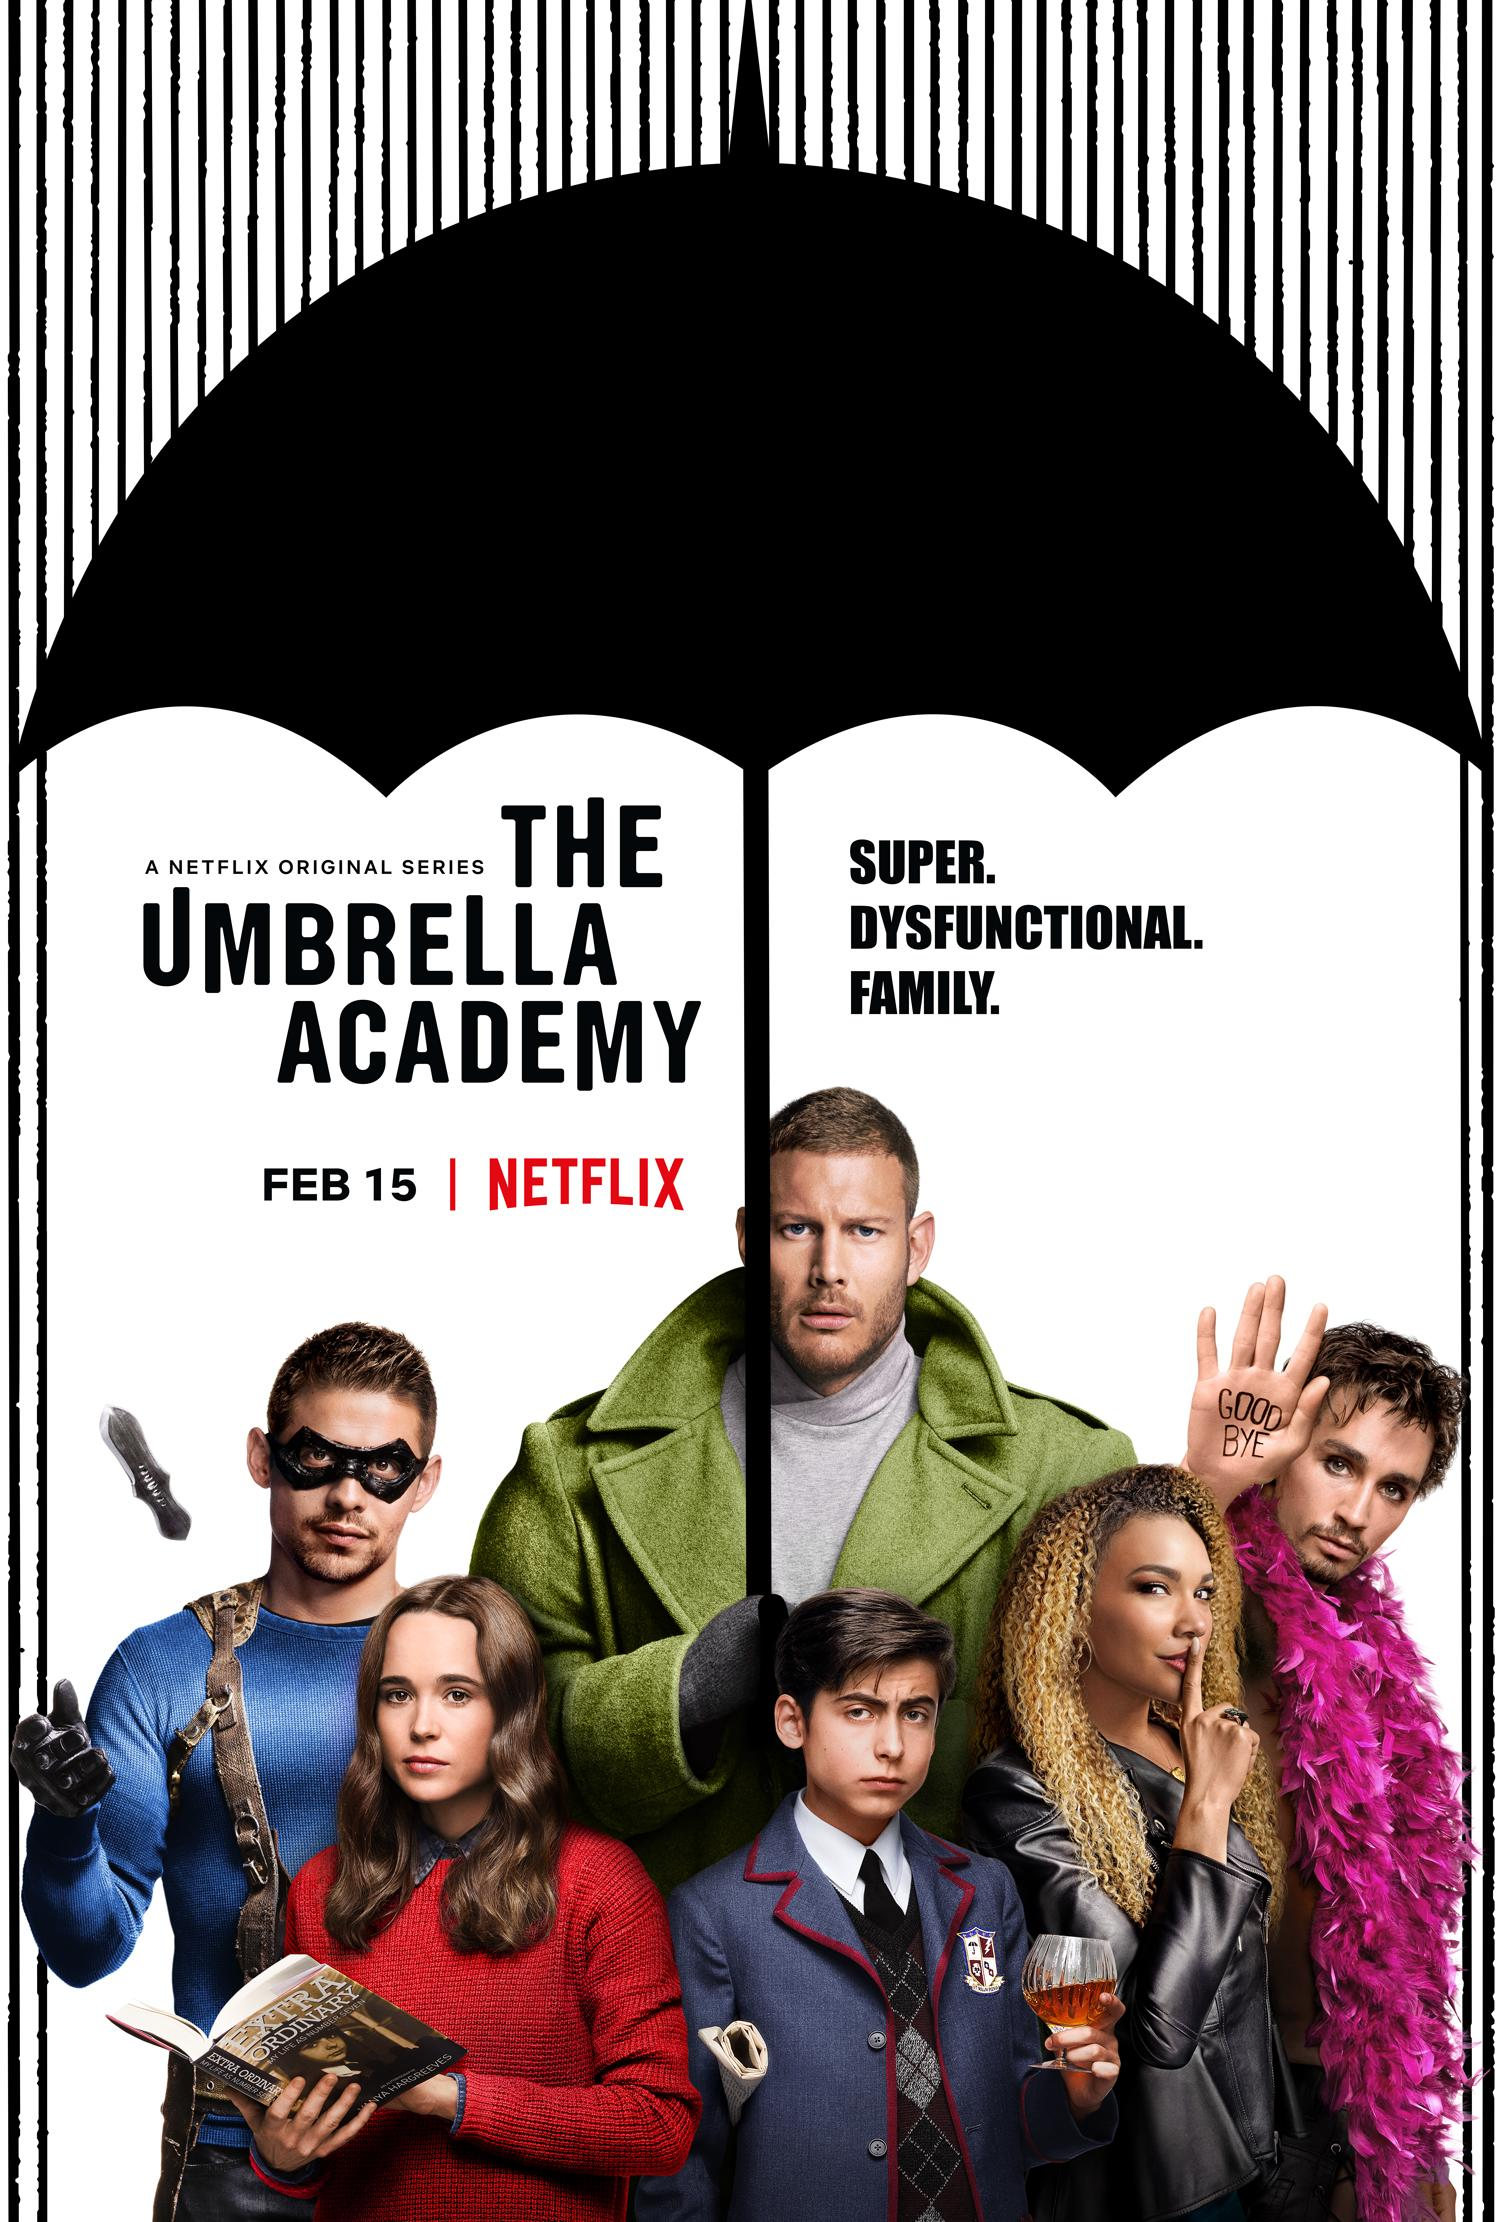 Umbrella Academy Trailer: Ellen Page Leads Netflix Superhero Adaptation